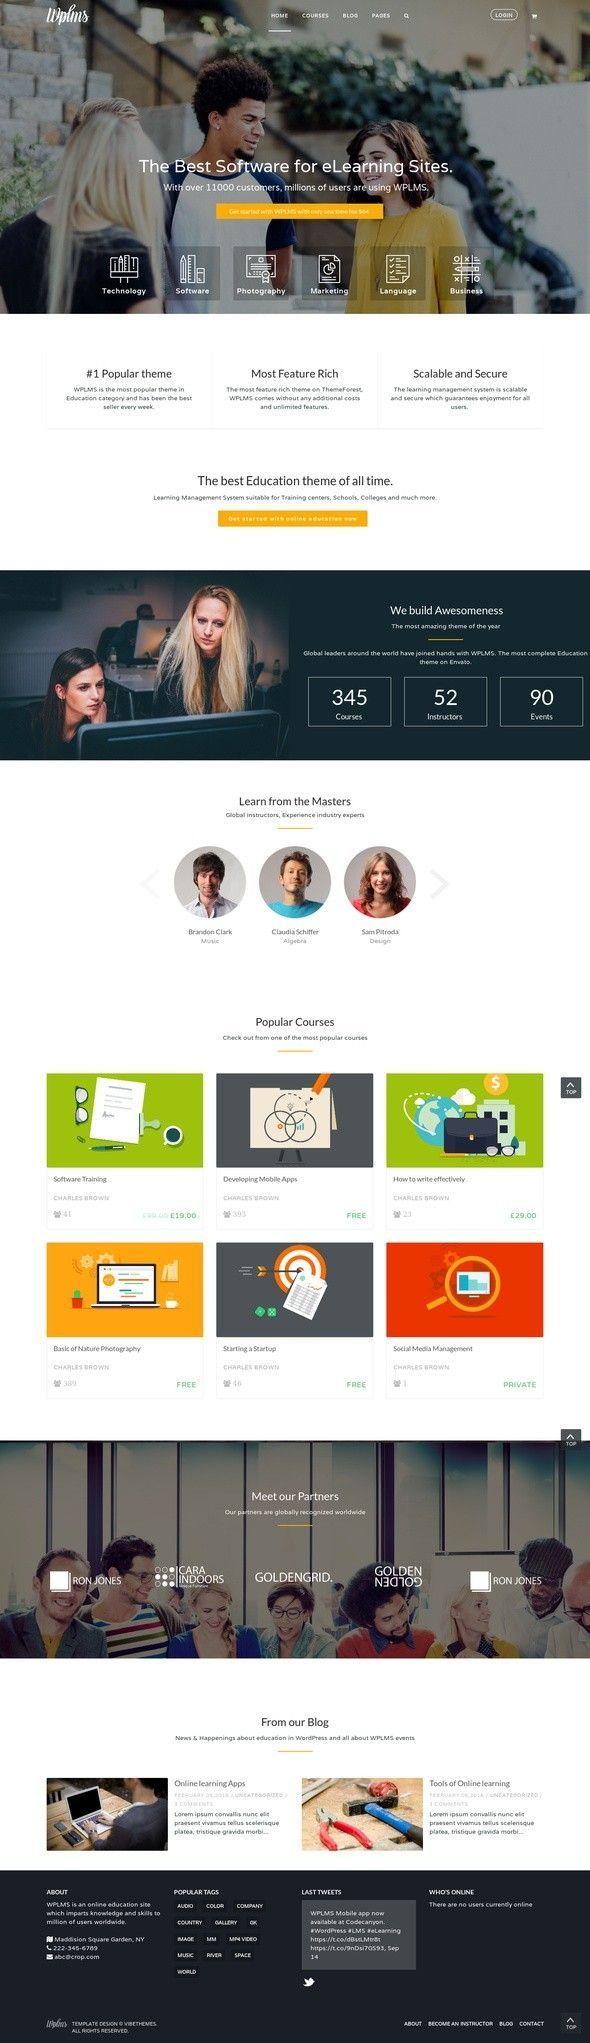 Mejores 28 imágenes de Nice looking websites en Pinterest | Cosas ...